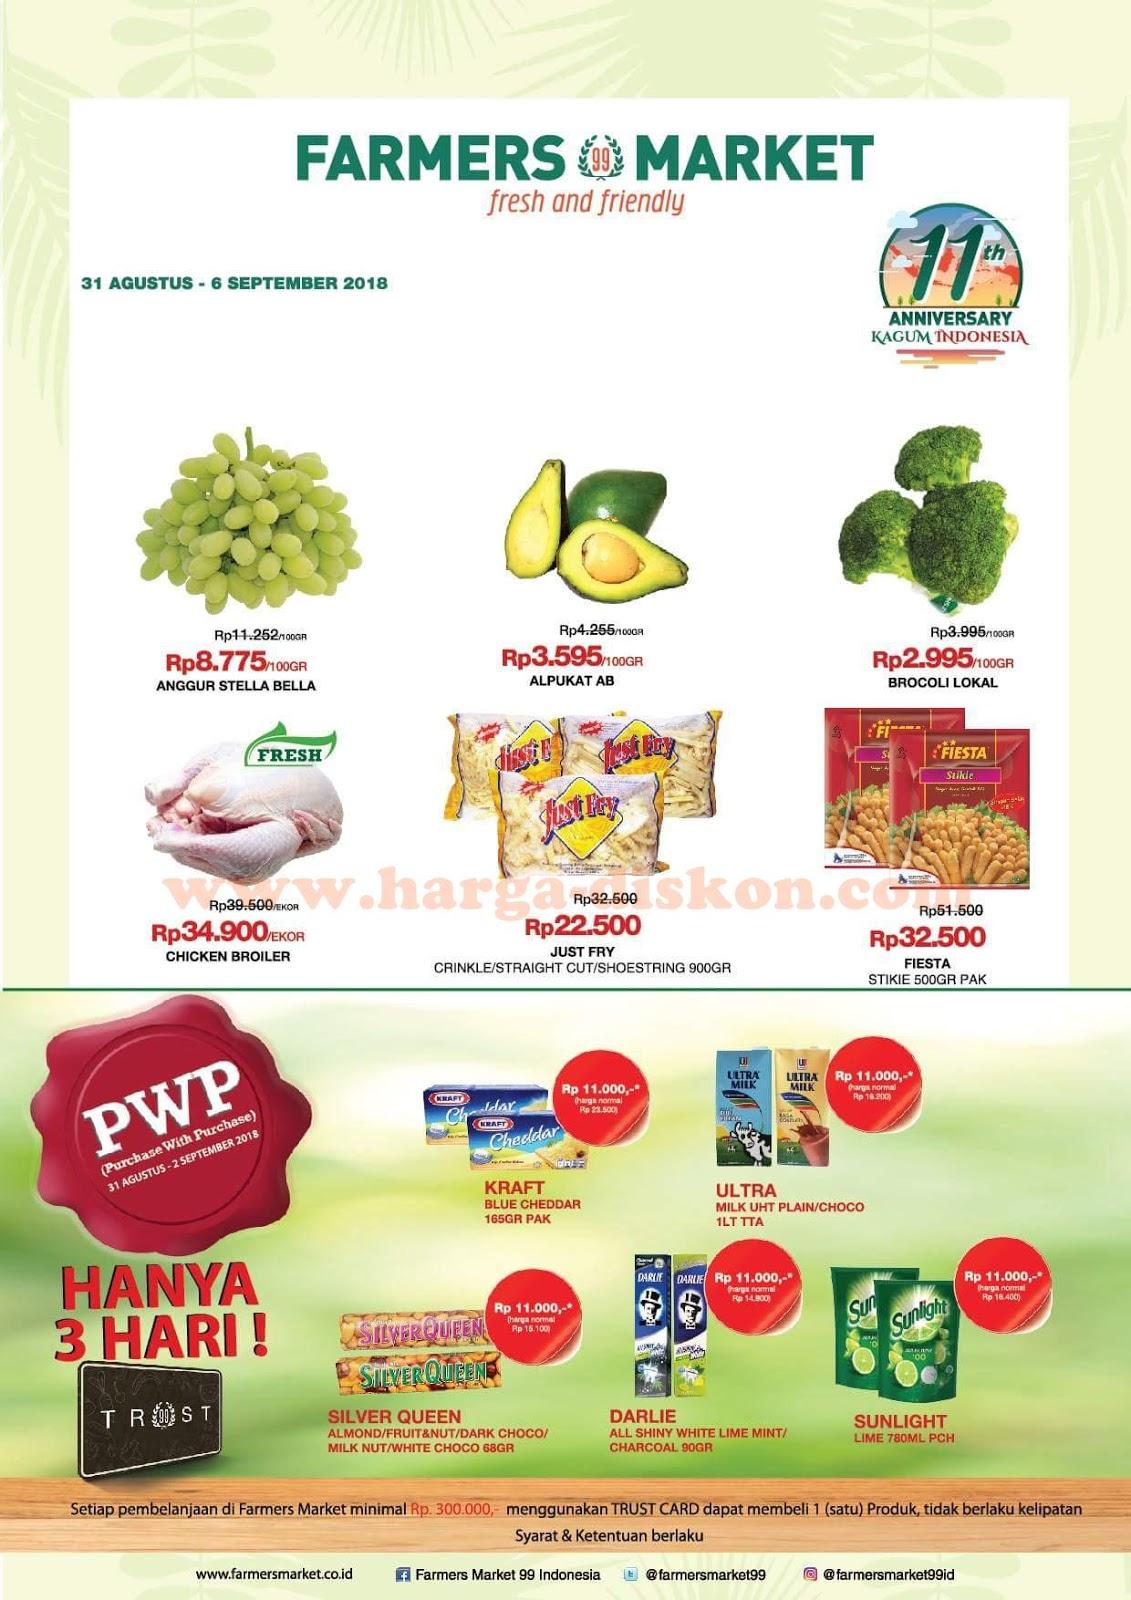 Promo Farmers Market Katalog Jsm Akhir Pekan 31 Agustus 6 September 2018 News And Talking